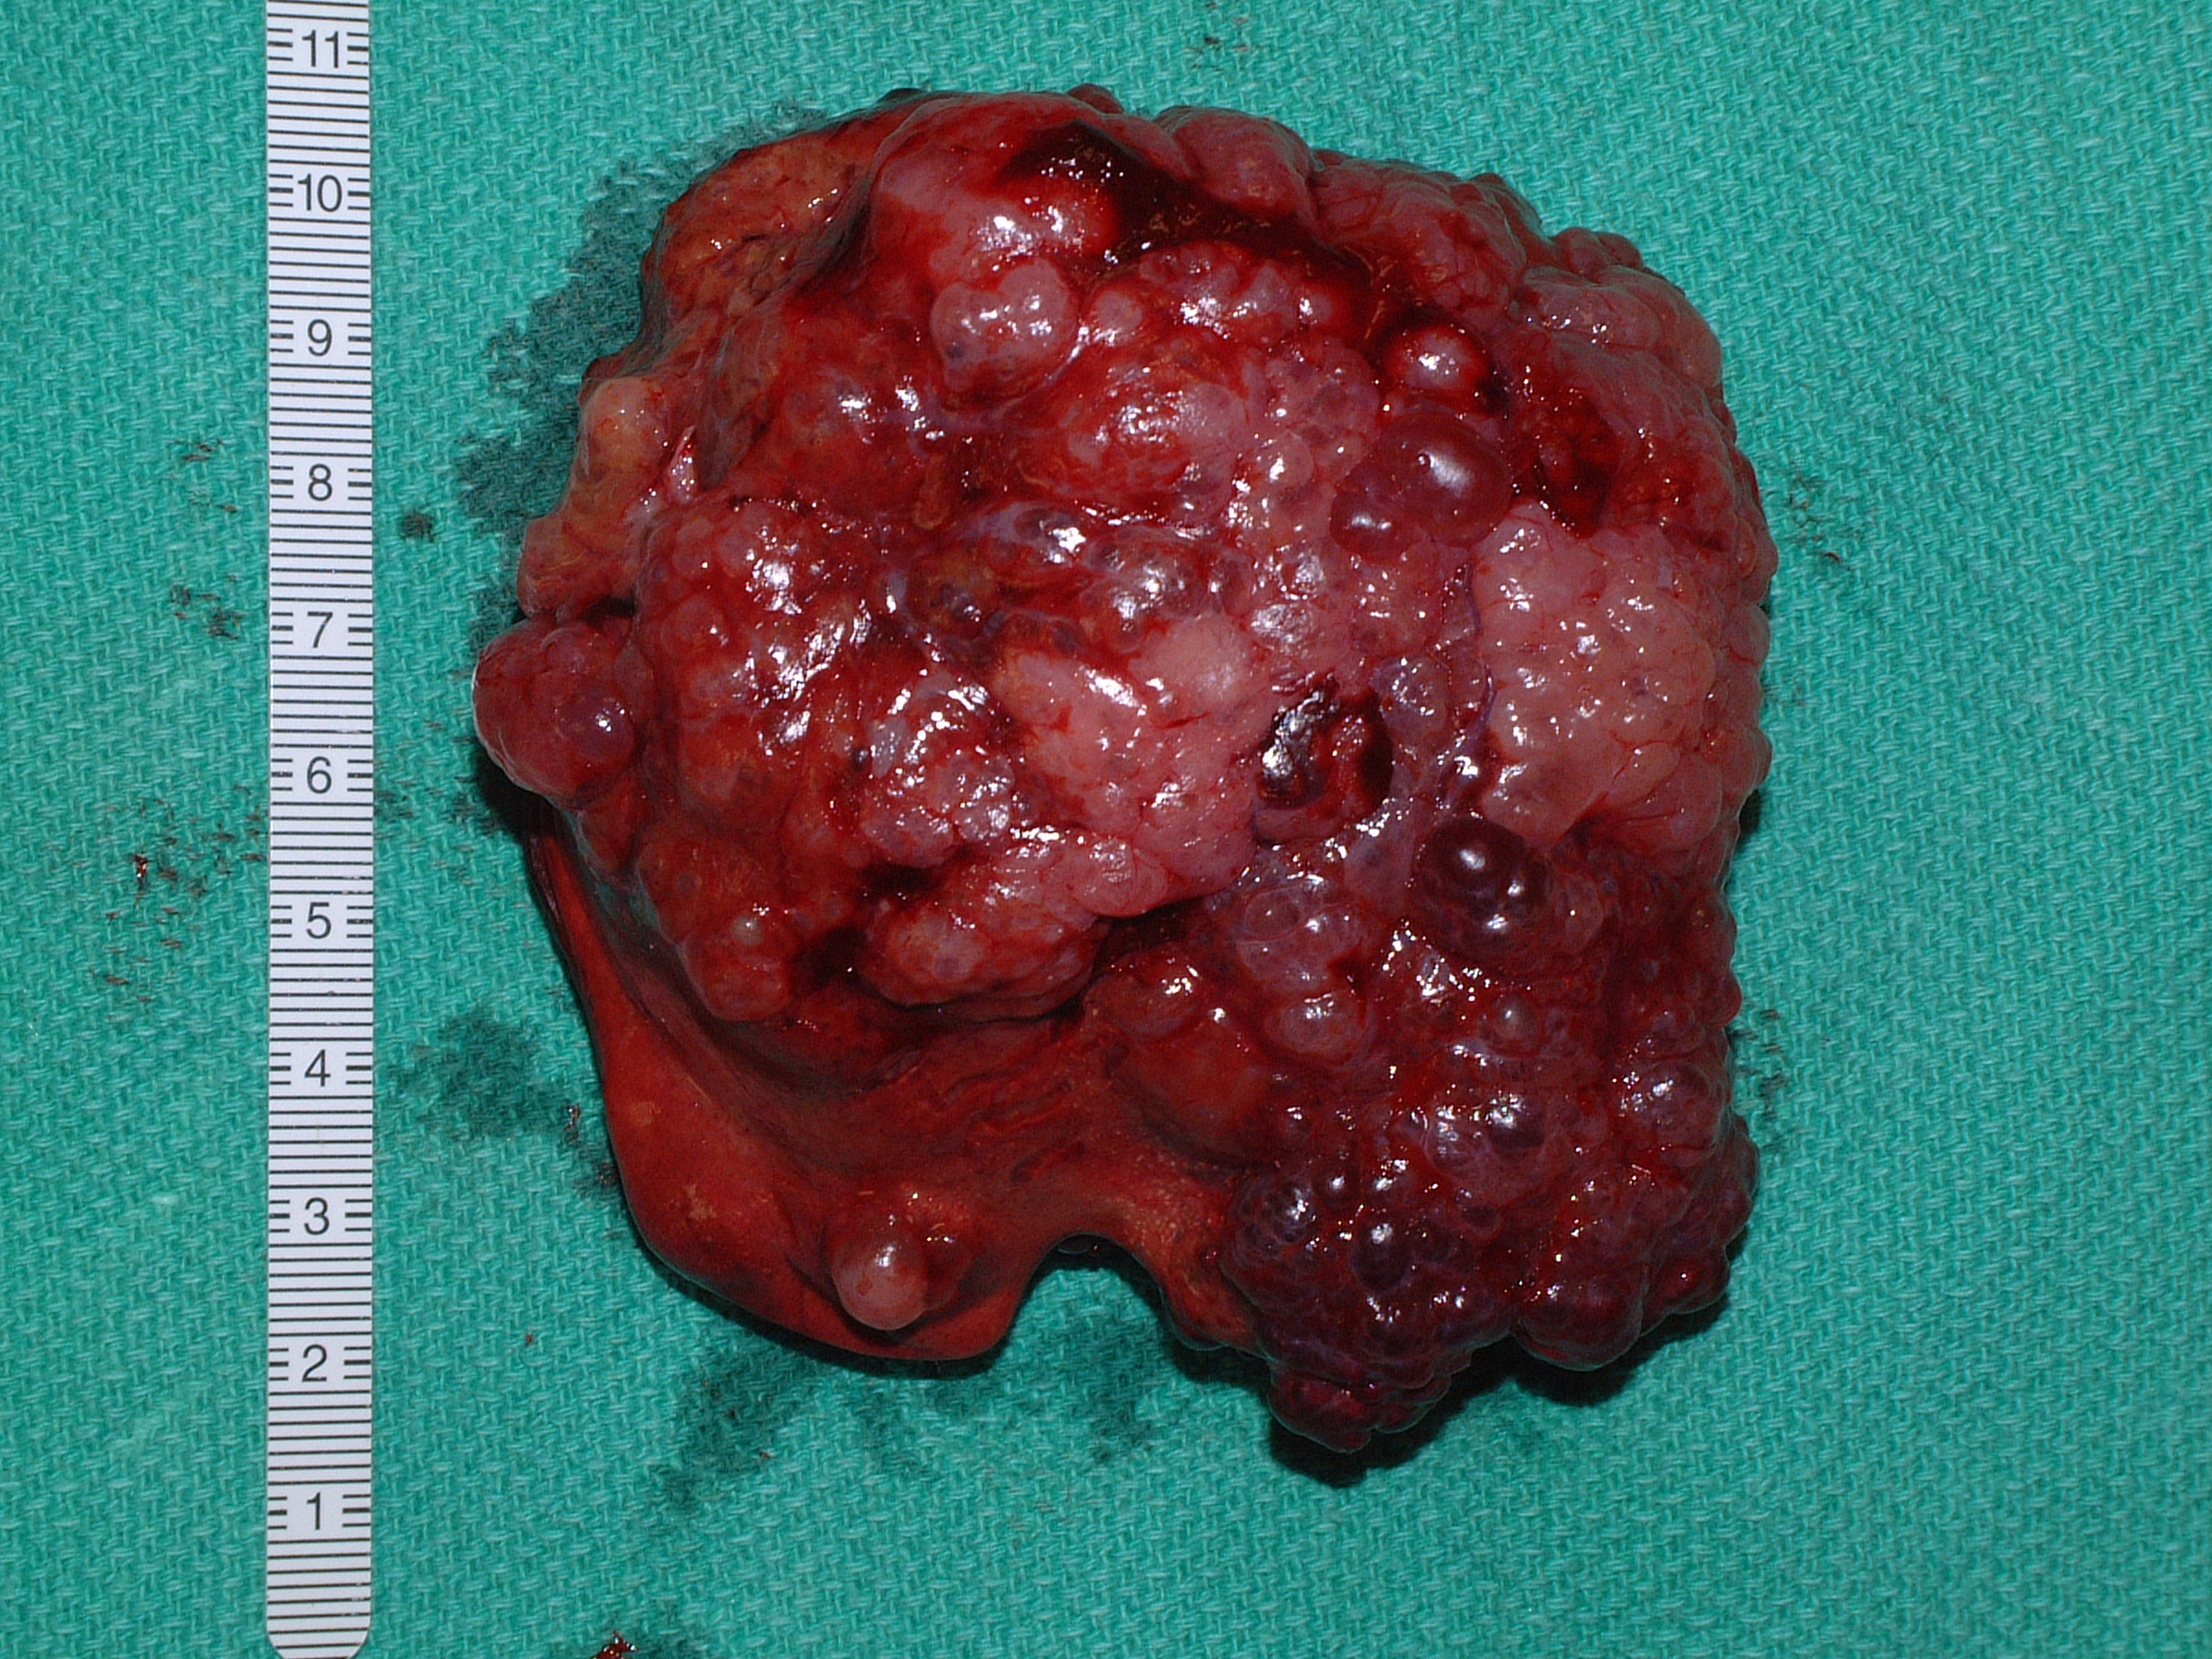 liver biliary cystadenoma 35 cat postop gross 39902.JPG